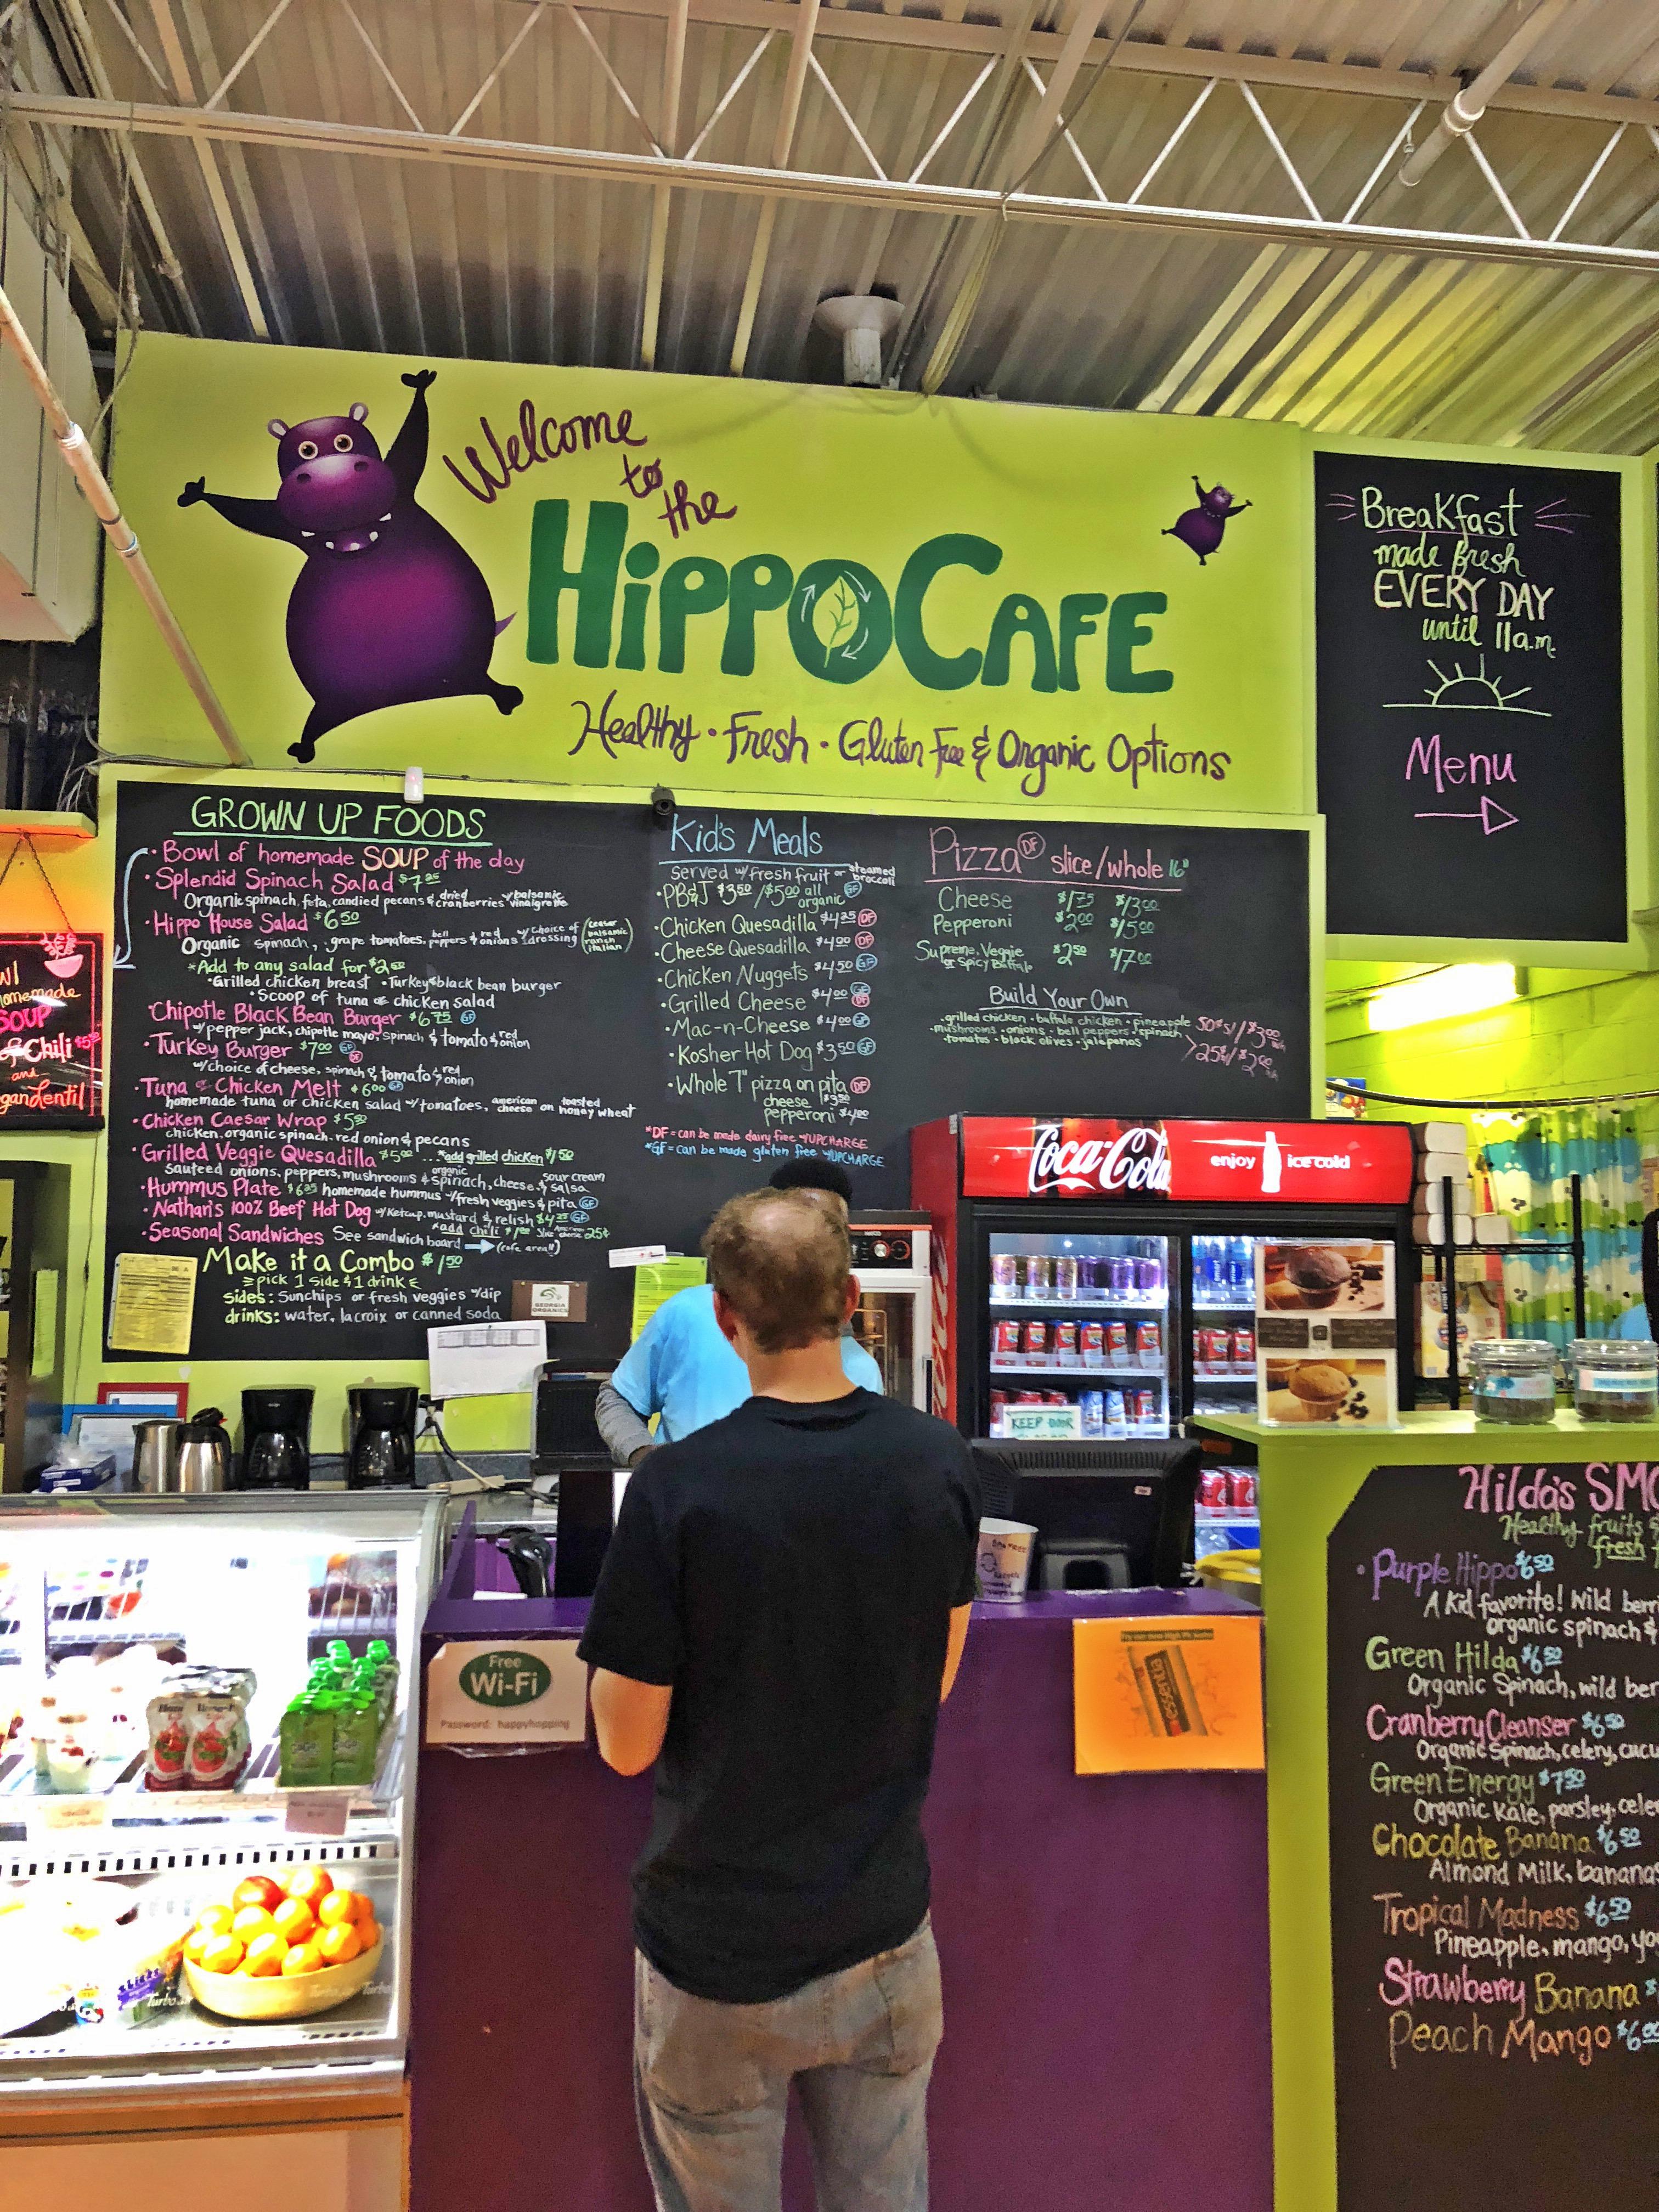 Hippo Cafe